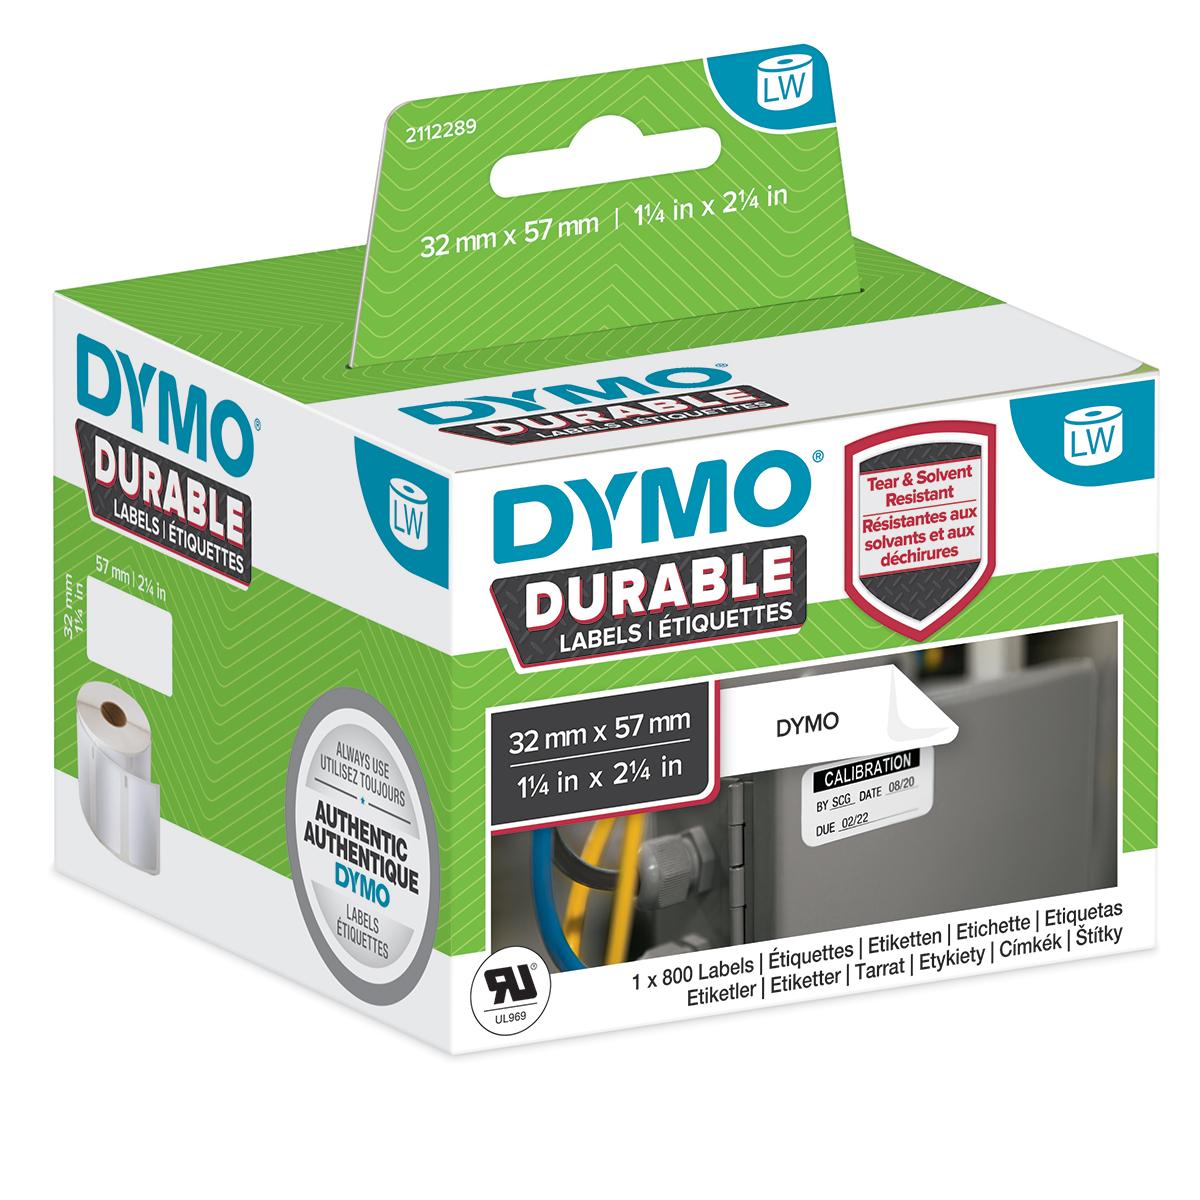 Dymo 2112289 LW Durable medium multi-purpose 57mm x 32mm Black on White